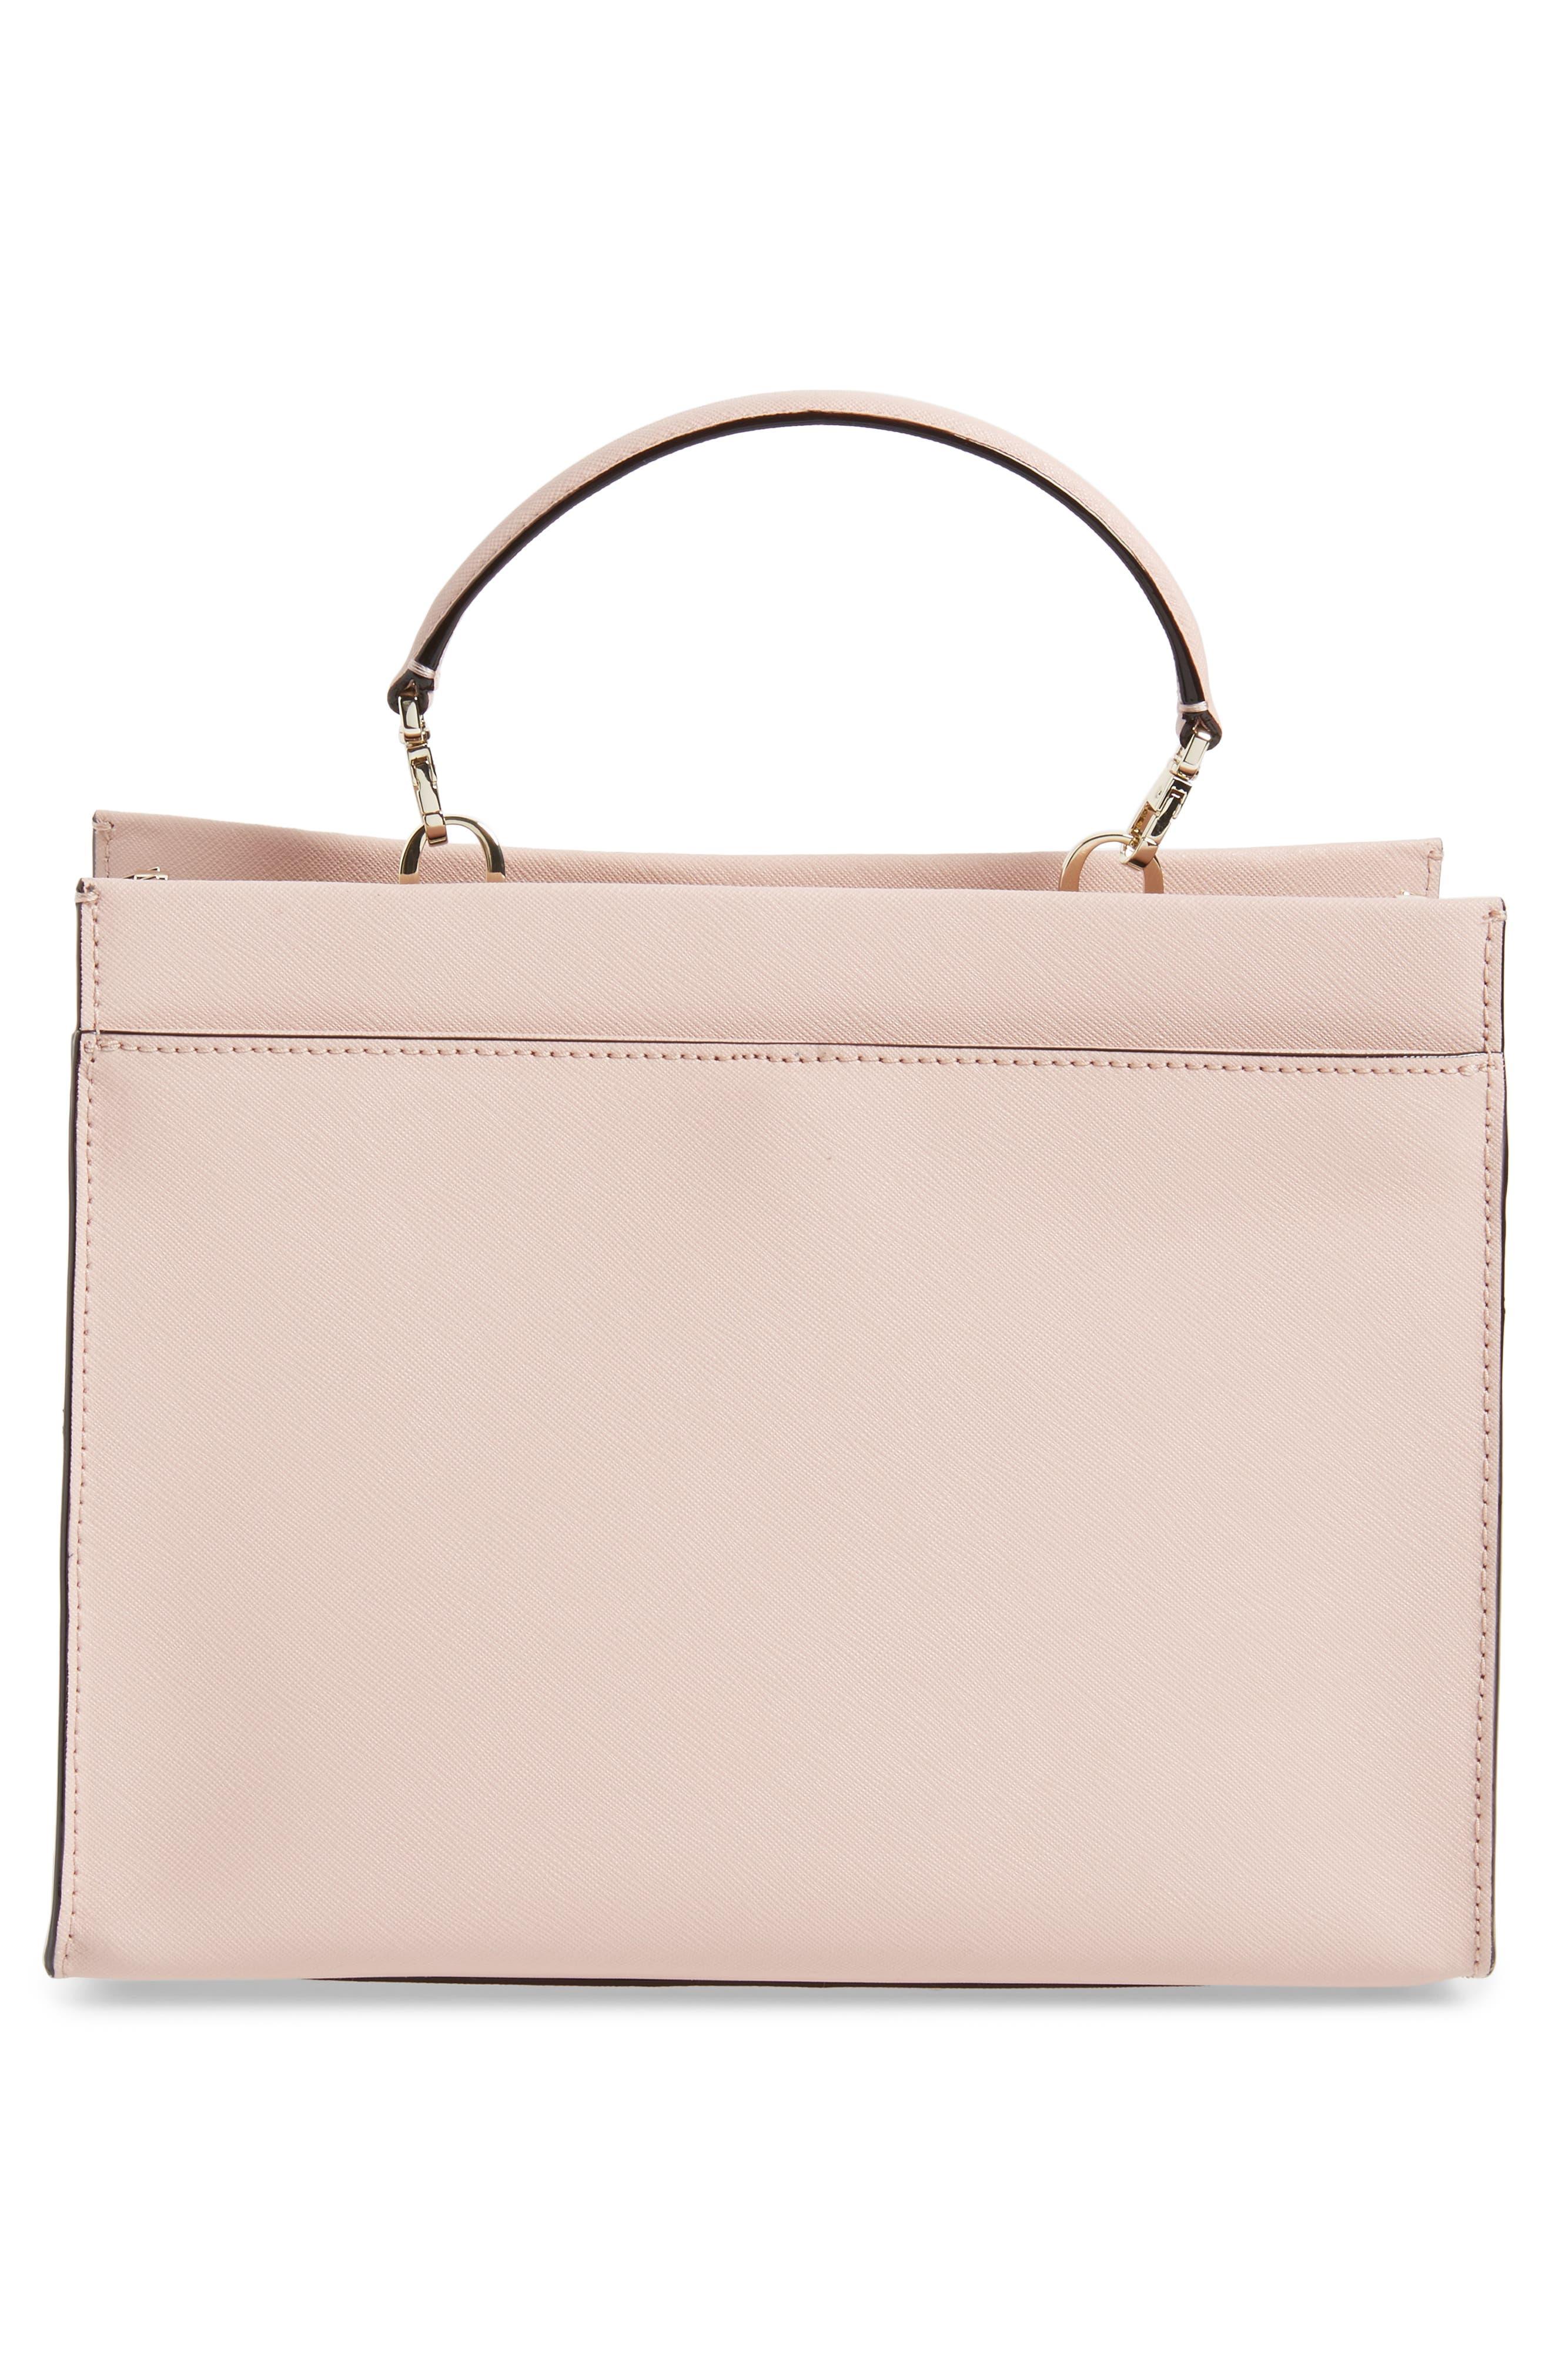 cameron street - sara leather satchel,                             Alternate thumbnail 3, color,                             Warm Vellum